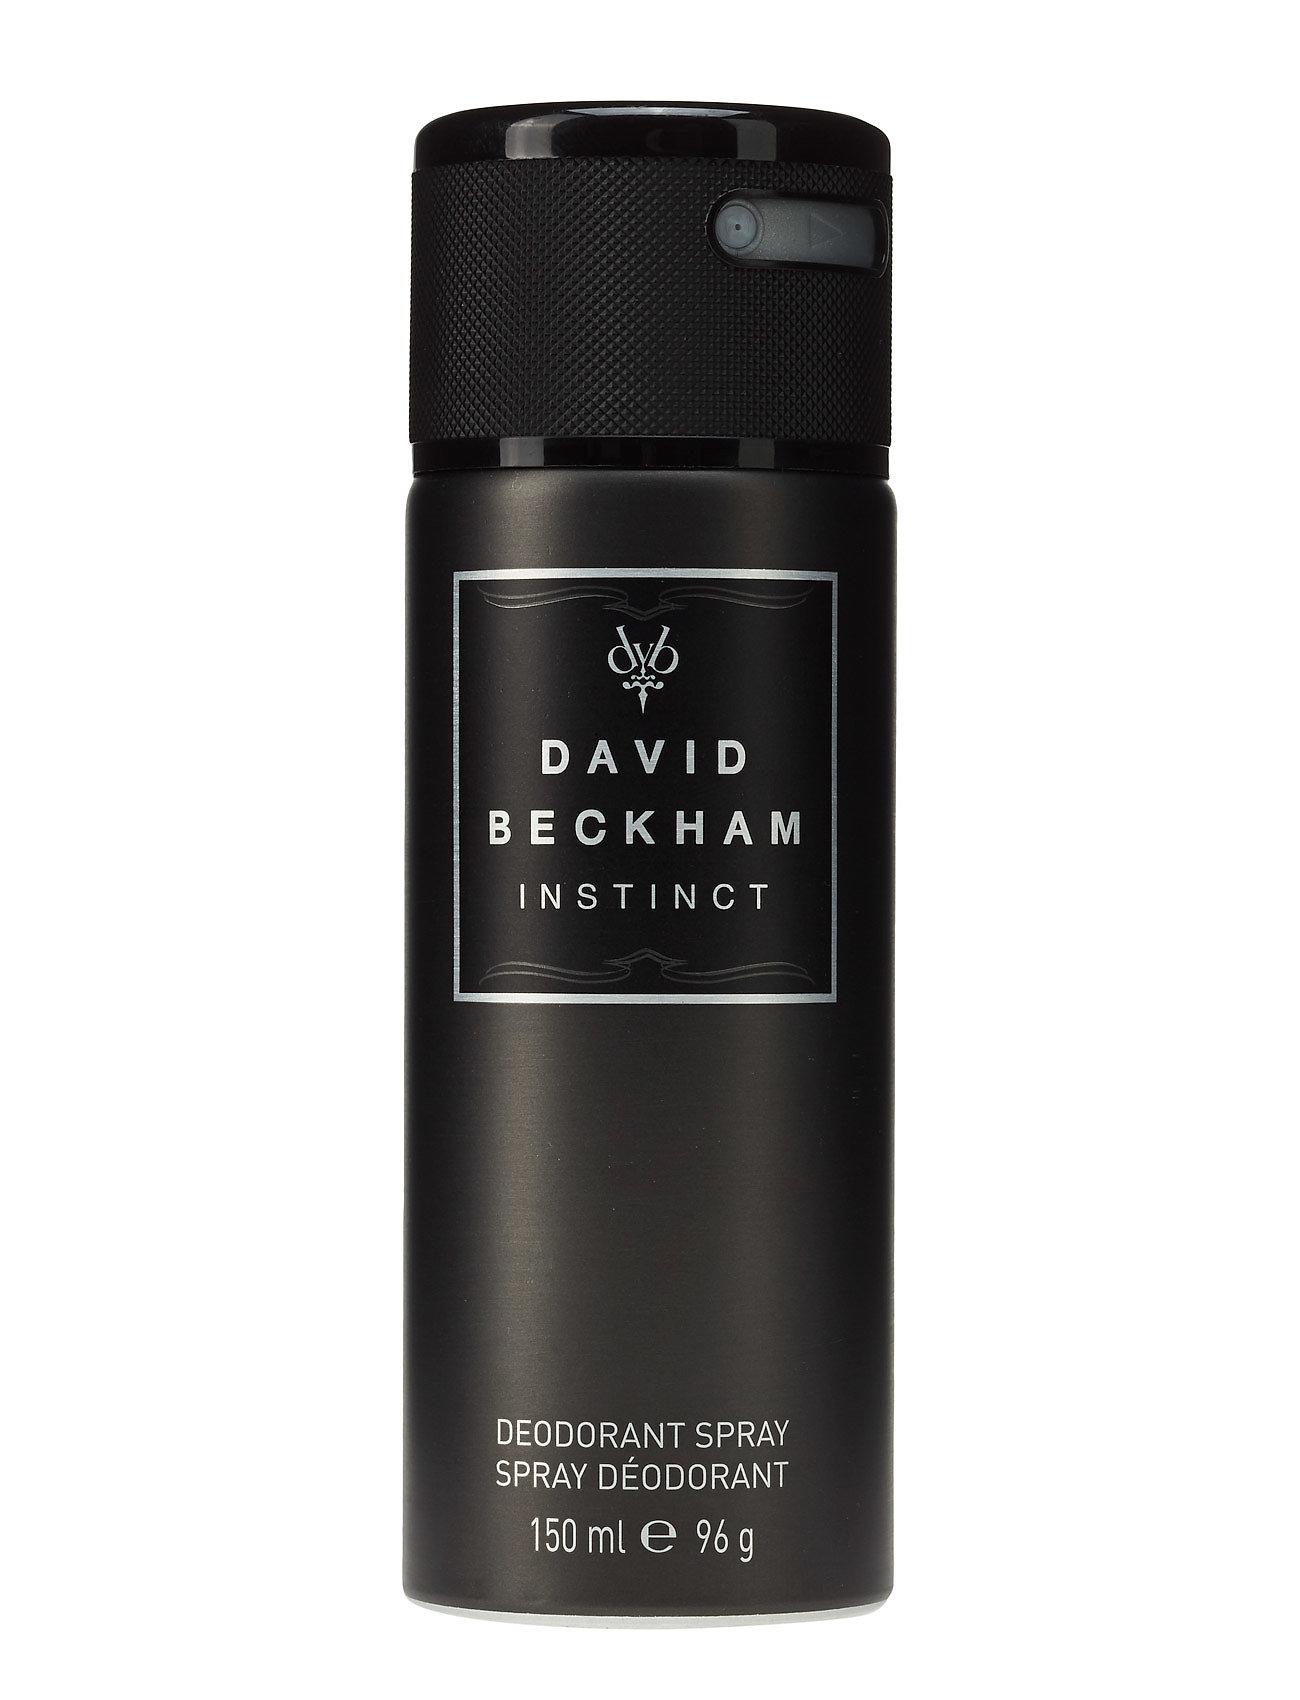 david beckham – David beckham instinct deodorant sp på boozt.com dk